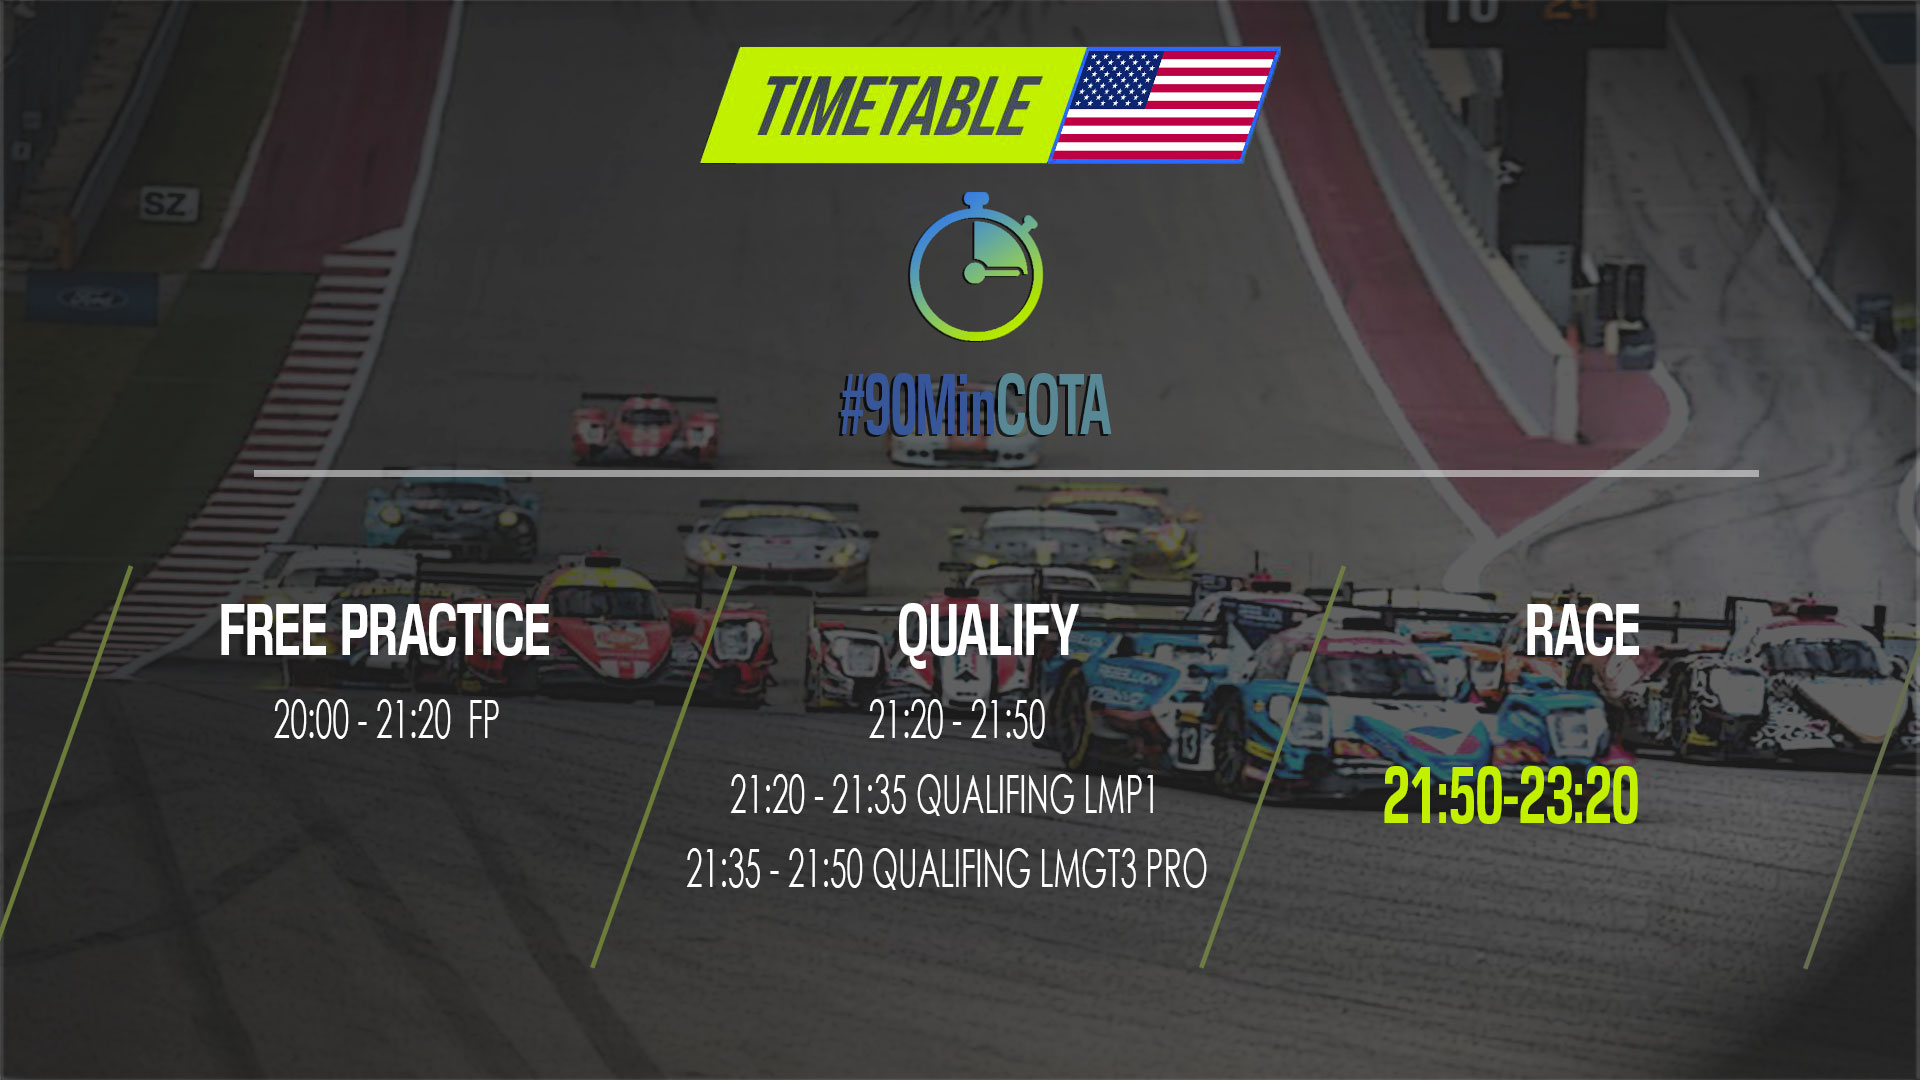 Timetable_COTA.jpg